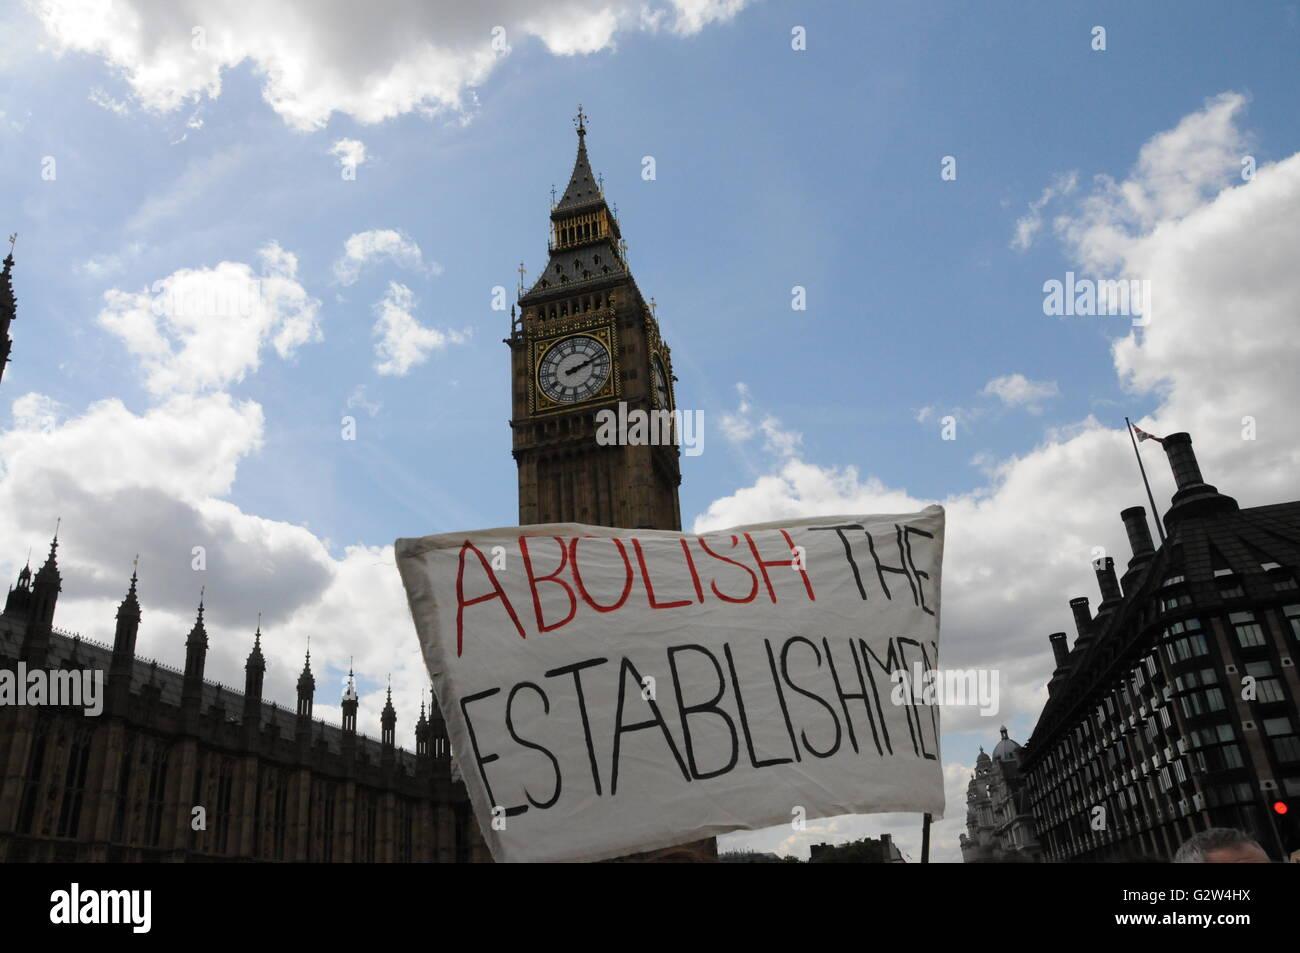 Anti-establishment placard held in front of Big Ben. - Stock Image